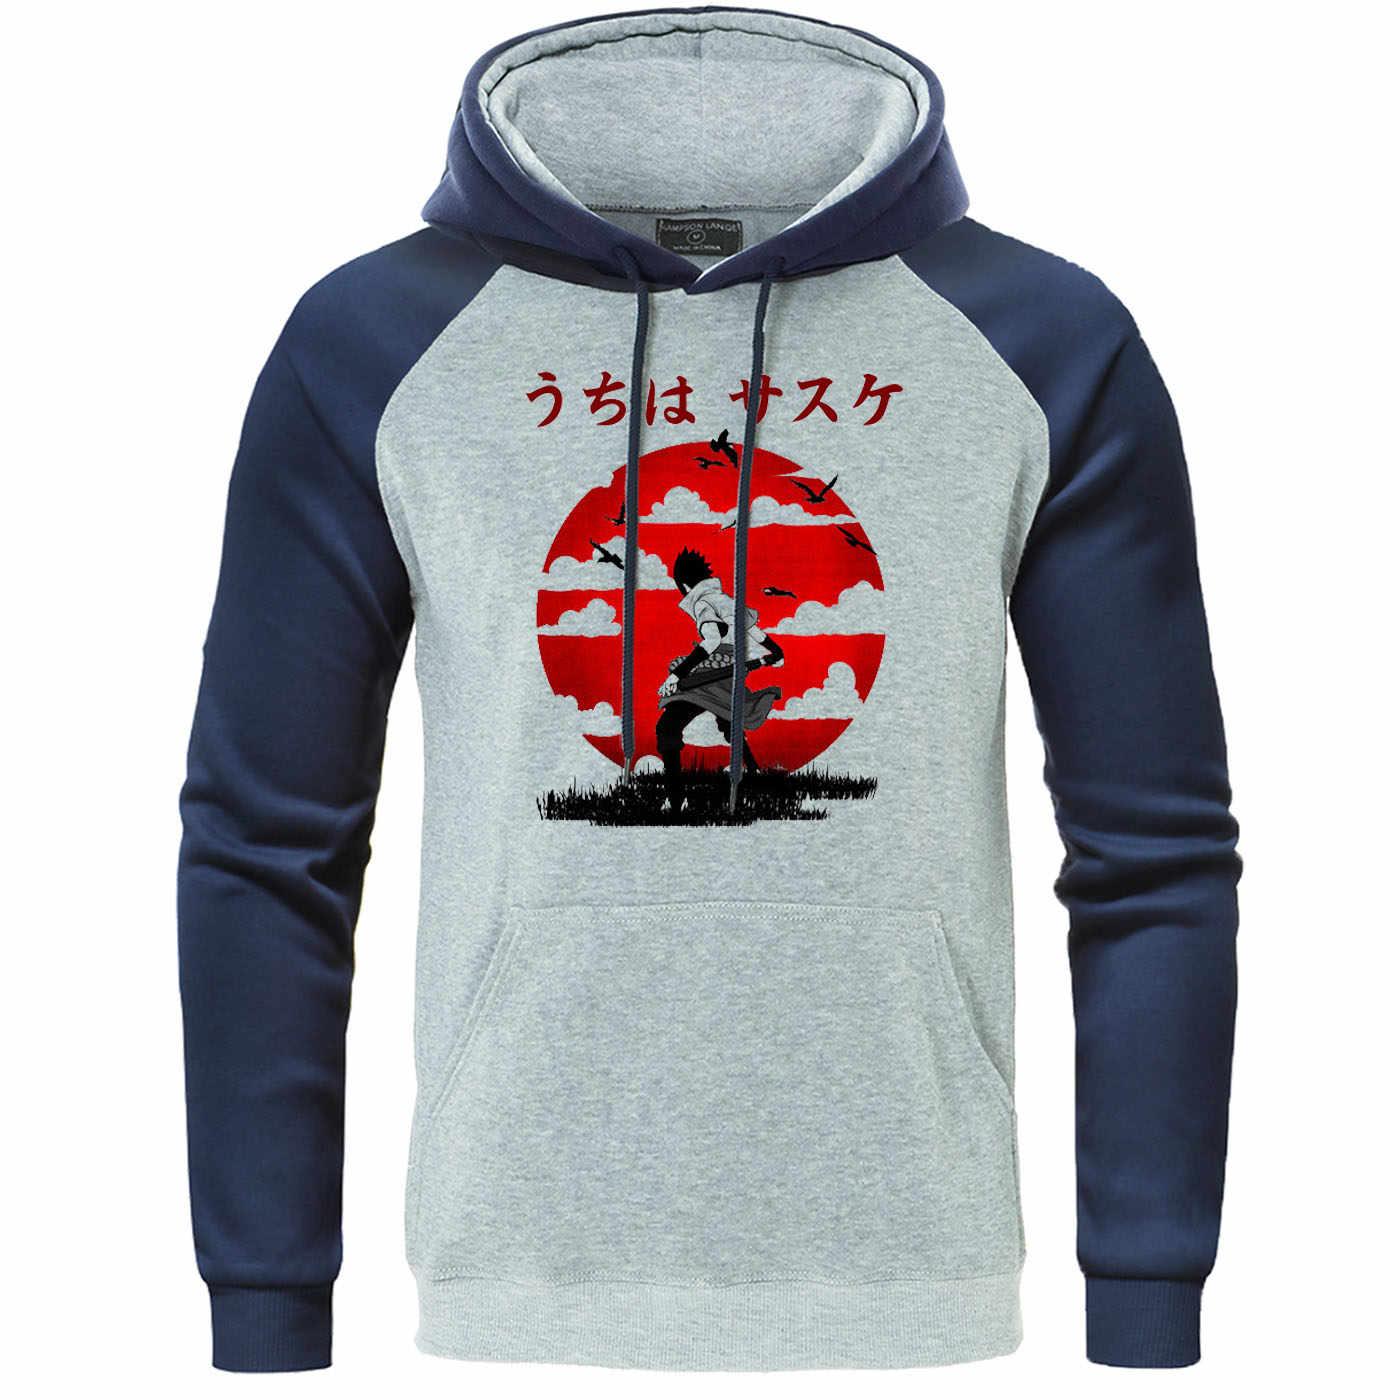 Japan Anime Hoodies Naruto Uchiha Sasuke Itachi Raglan Pullover Samurai Sweatshirt Harajuku Streetwear Kleidung Männer Casual Hoody